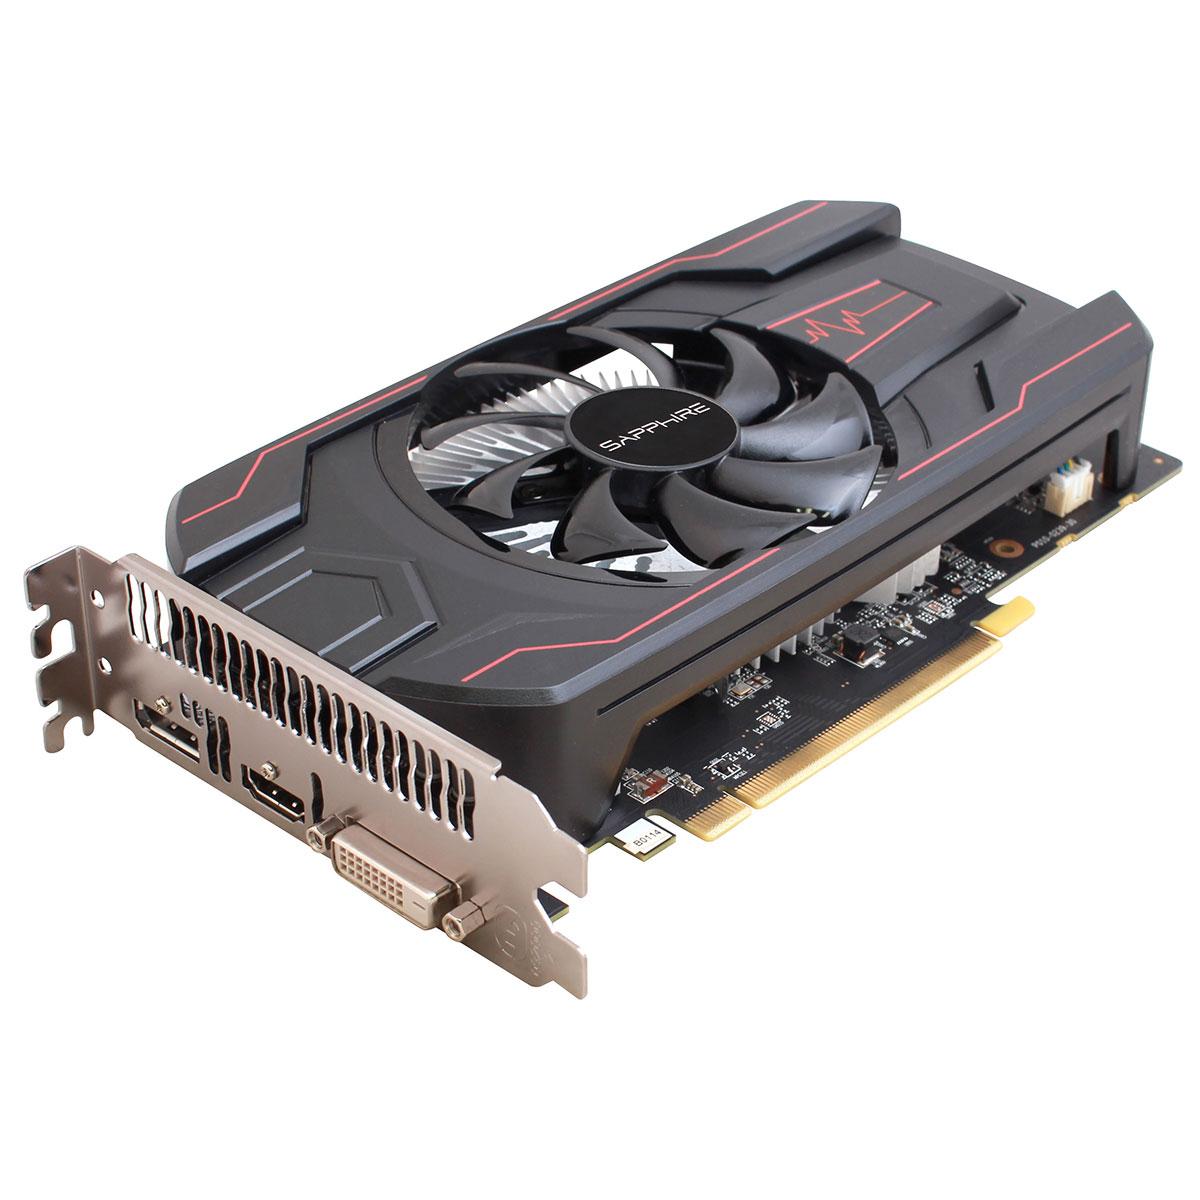 Carte graphique Sapphire PULSE Radeon RX 560 2GD5 OC Lite 2 Go DVI/HDMI/DisplayPort - PCI Express (AMD Radeon RX 560)